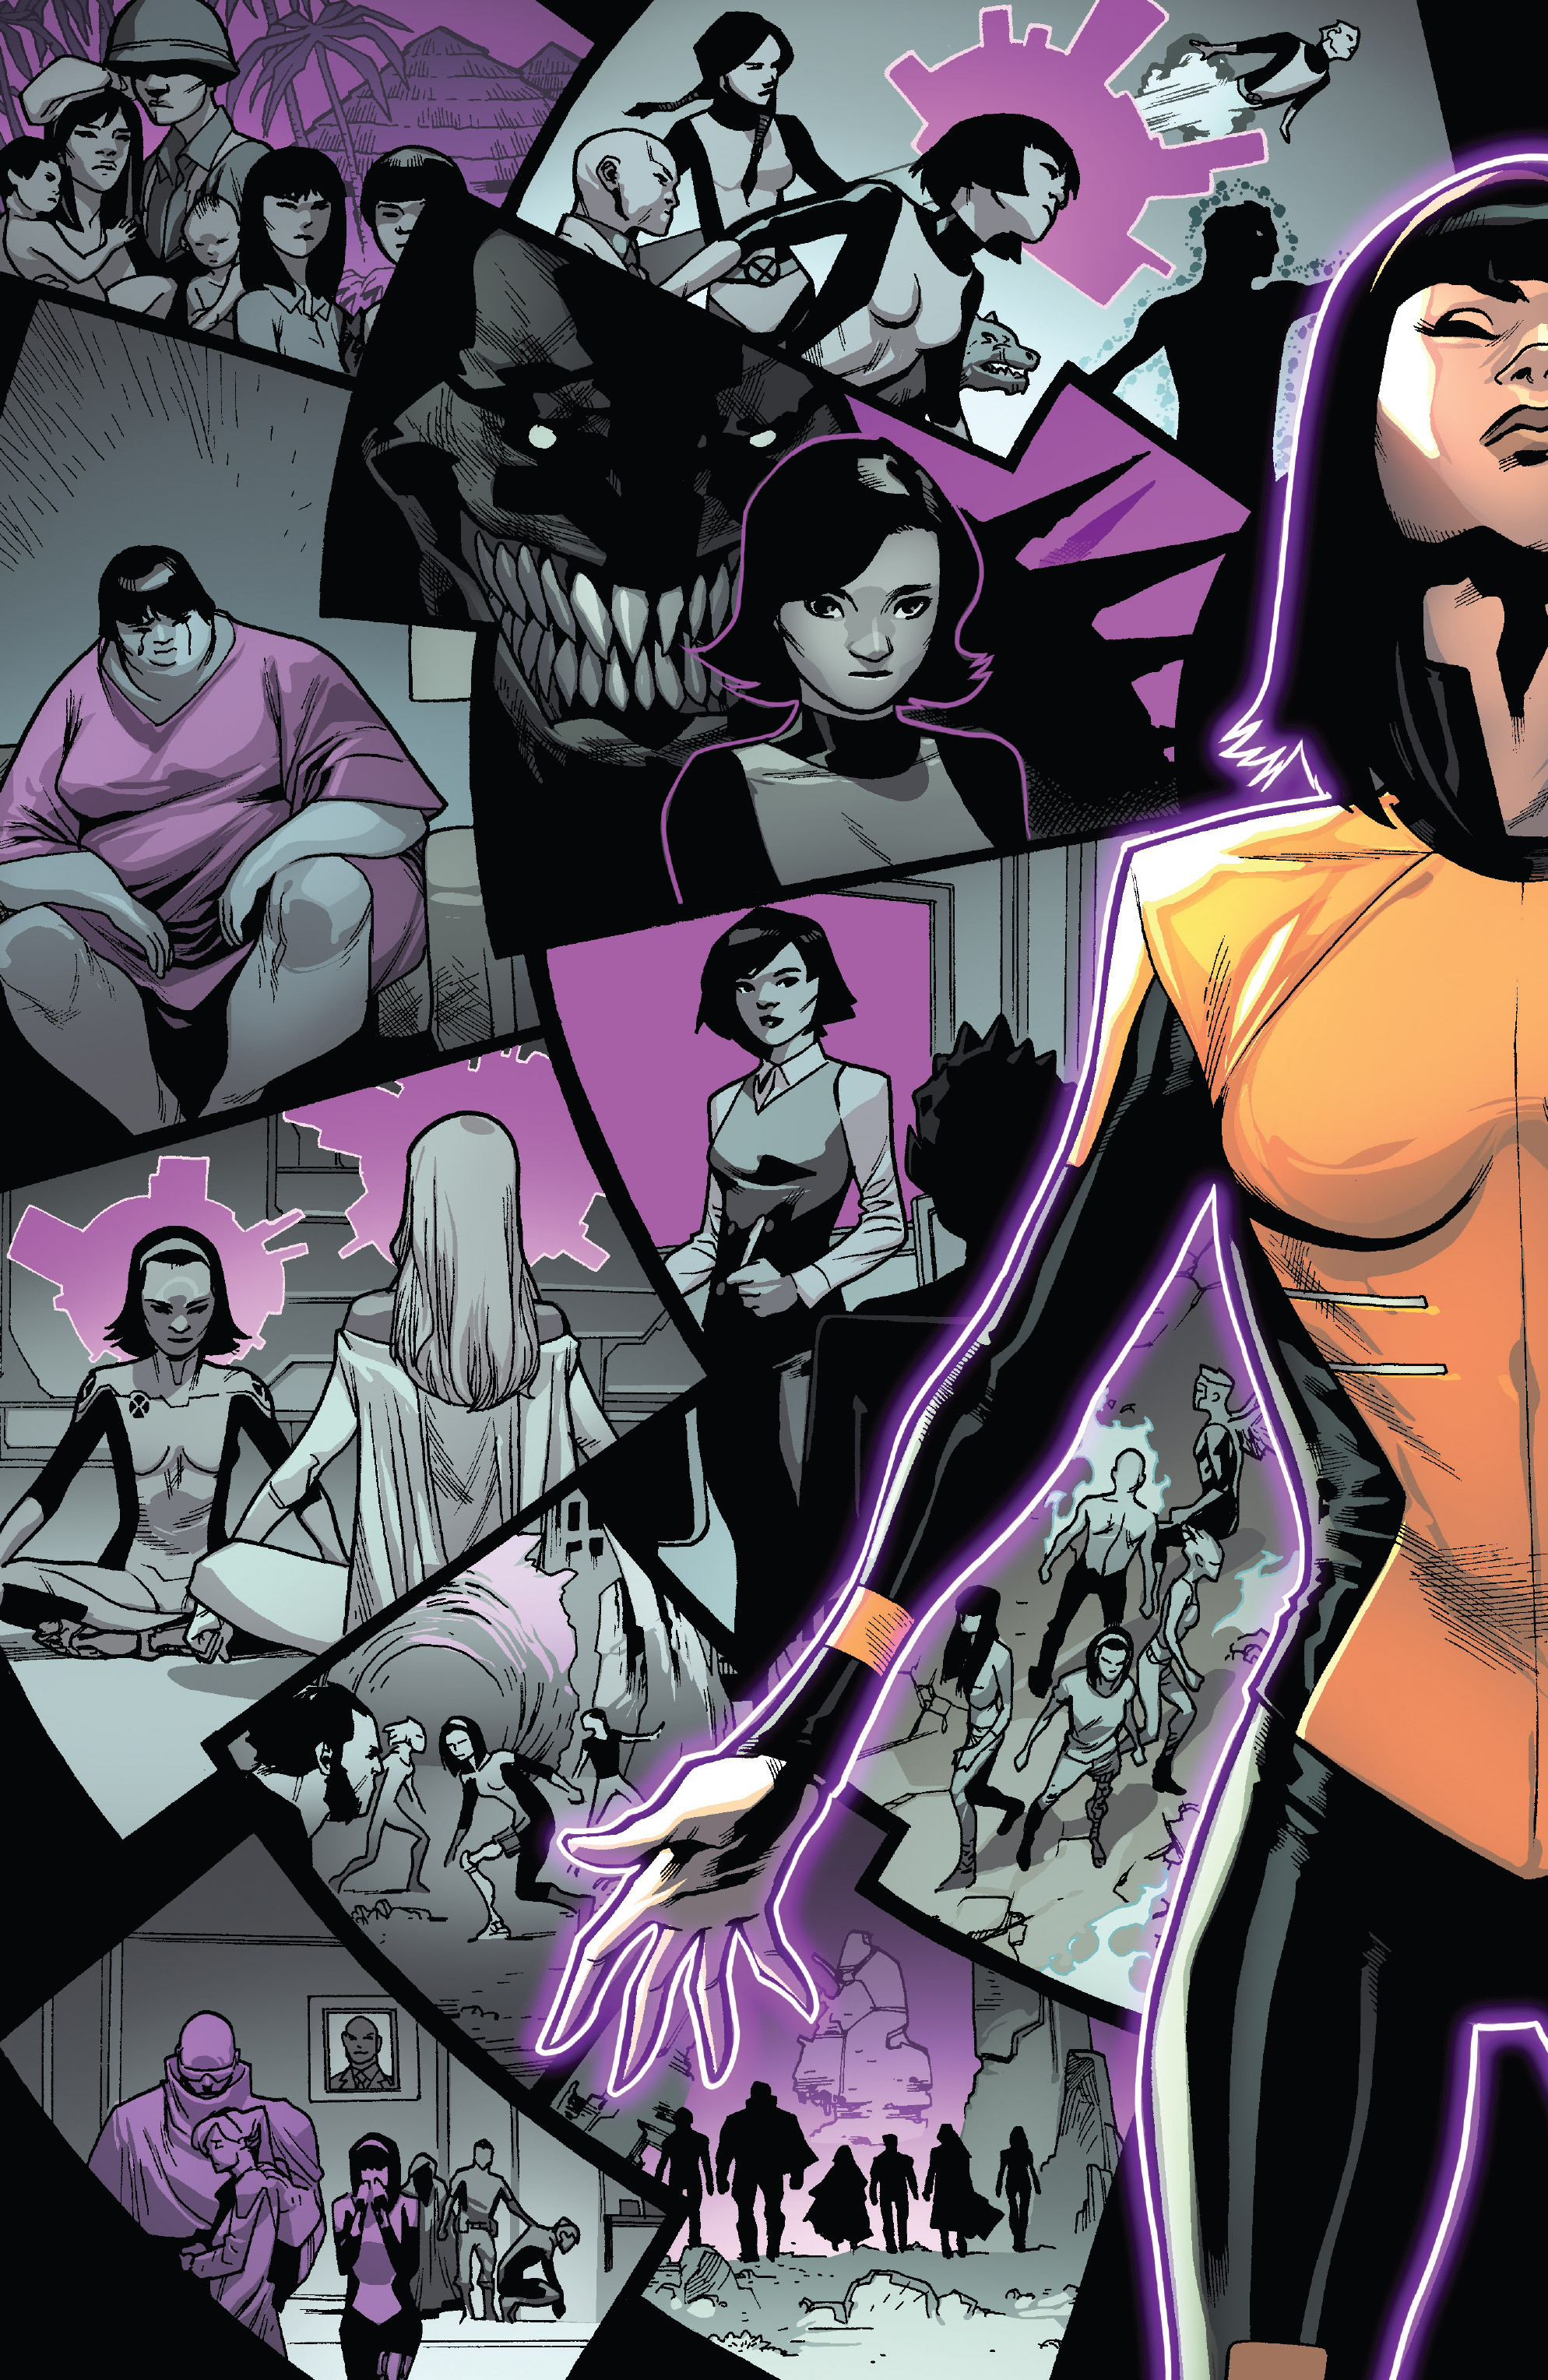 All-New X-Men (2013) chap 41 pic 17